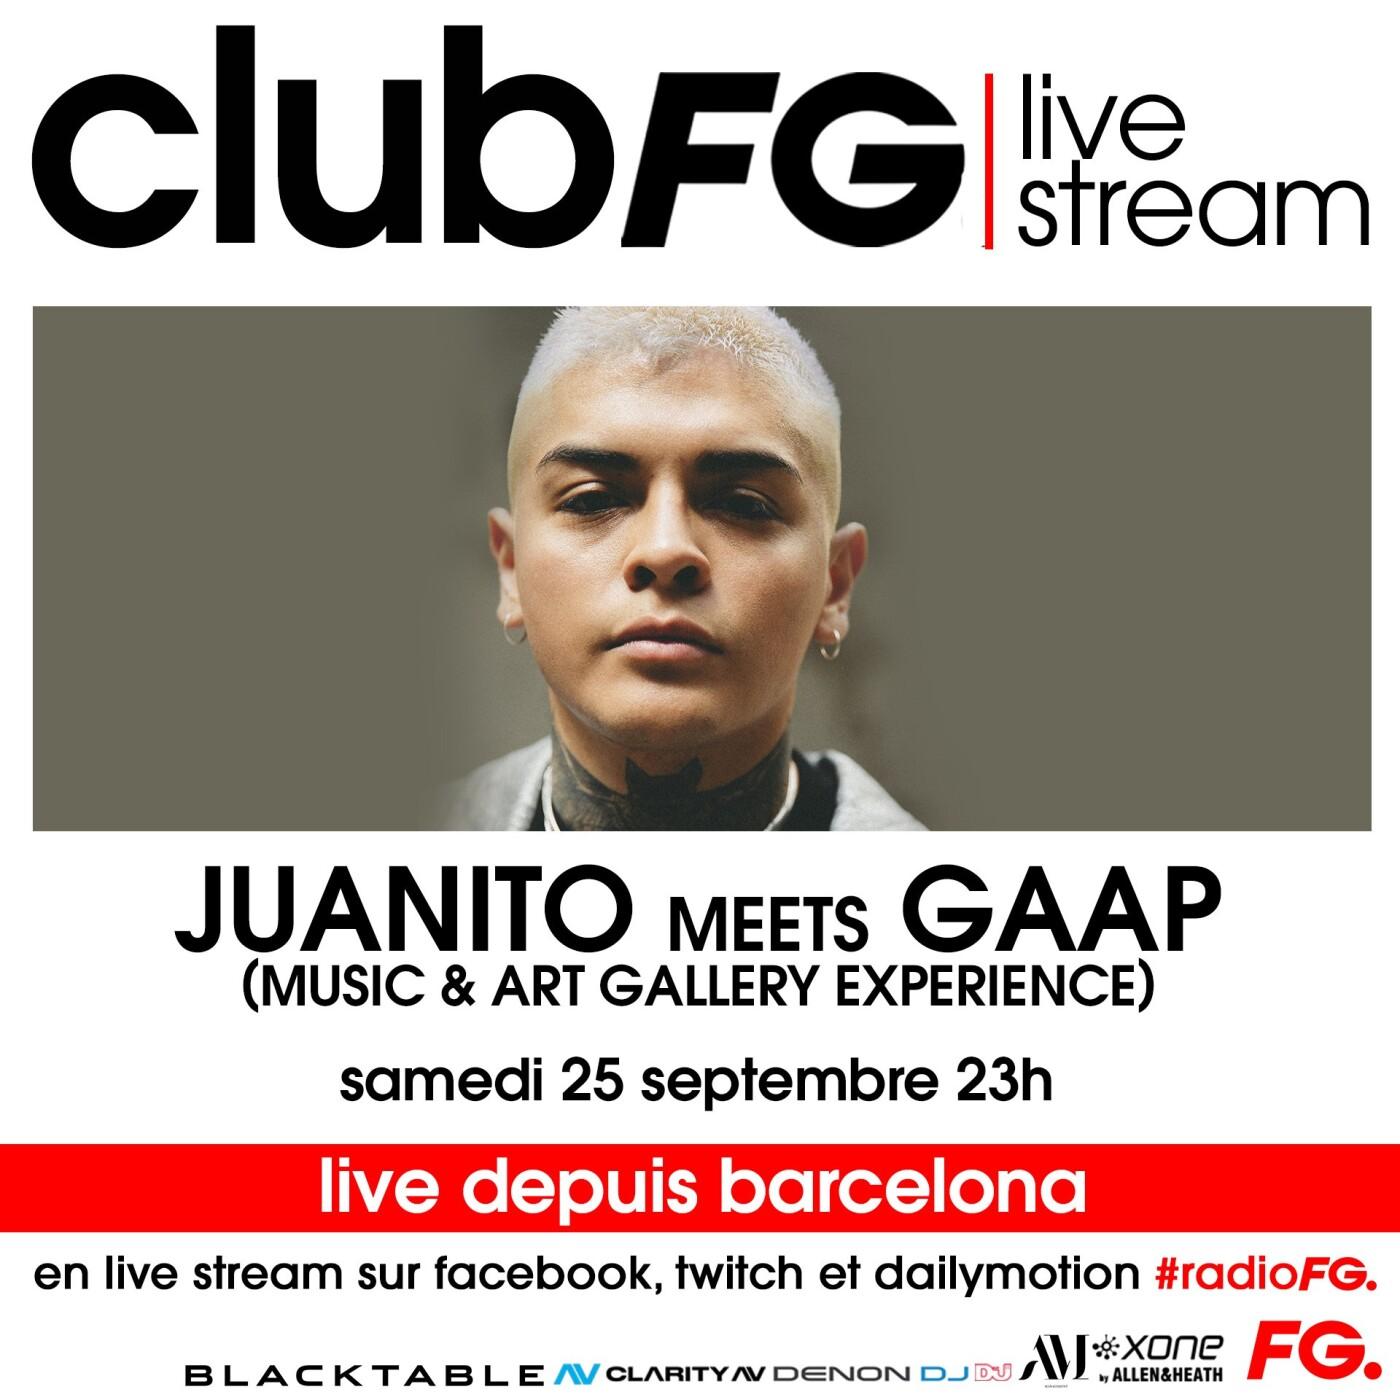 CLUB FG LIVE STREAM : JUANITO